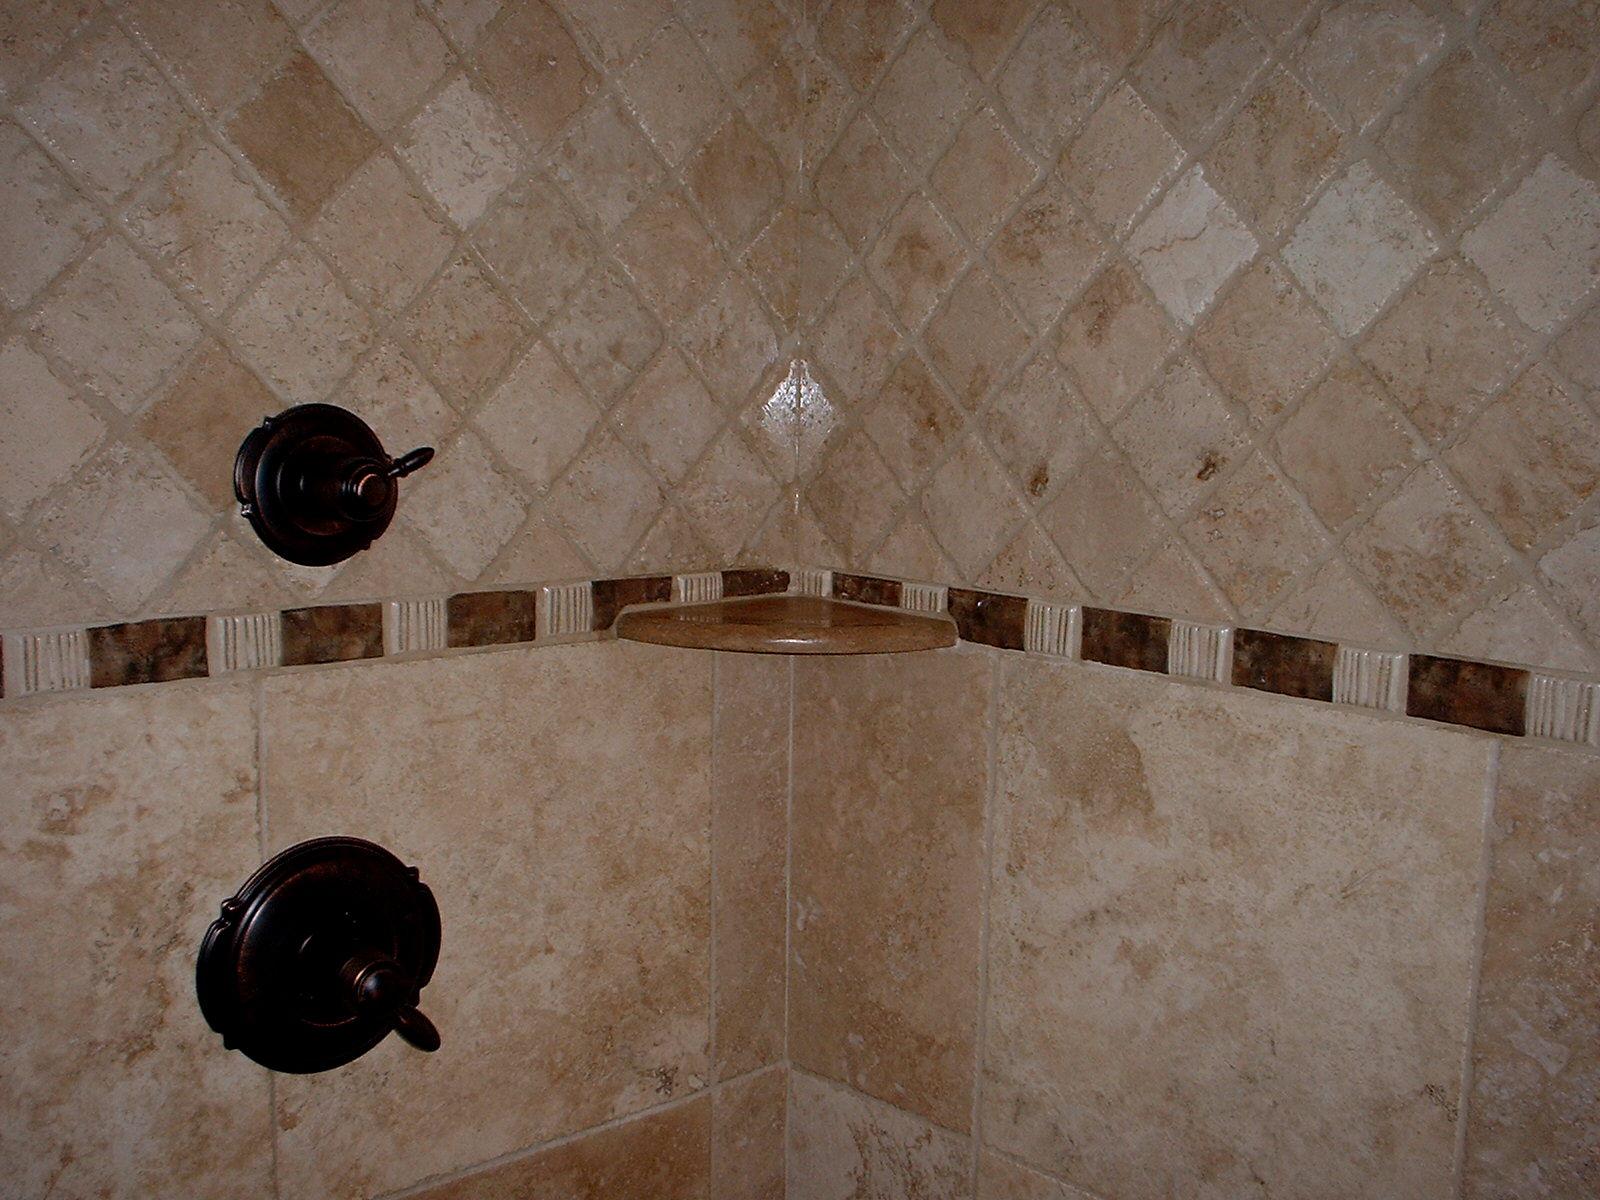 inspirational corner bathroom sink ideas-Terrific Corner Bathroom Sink Plan